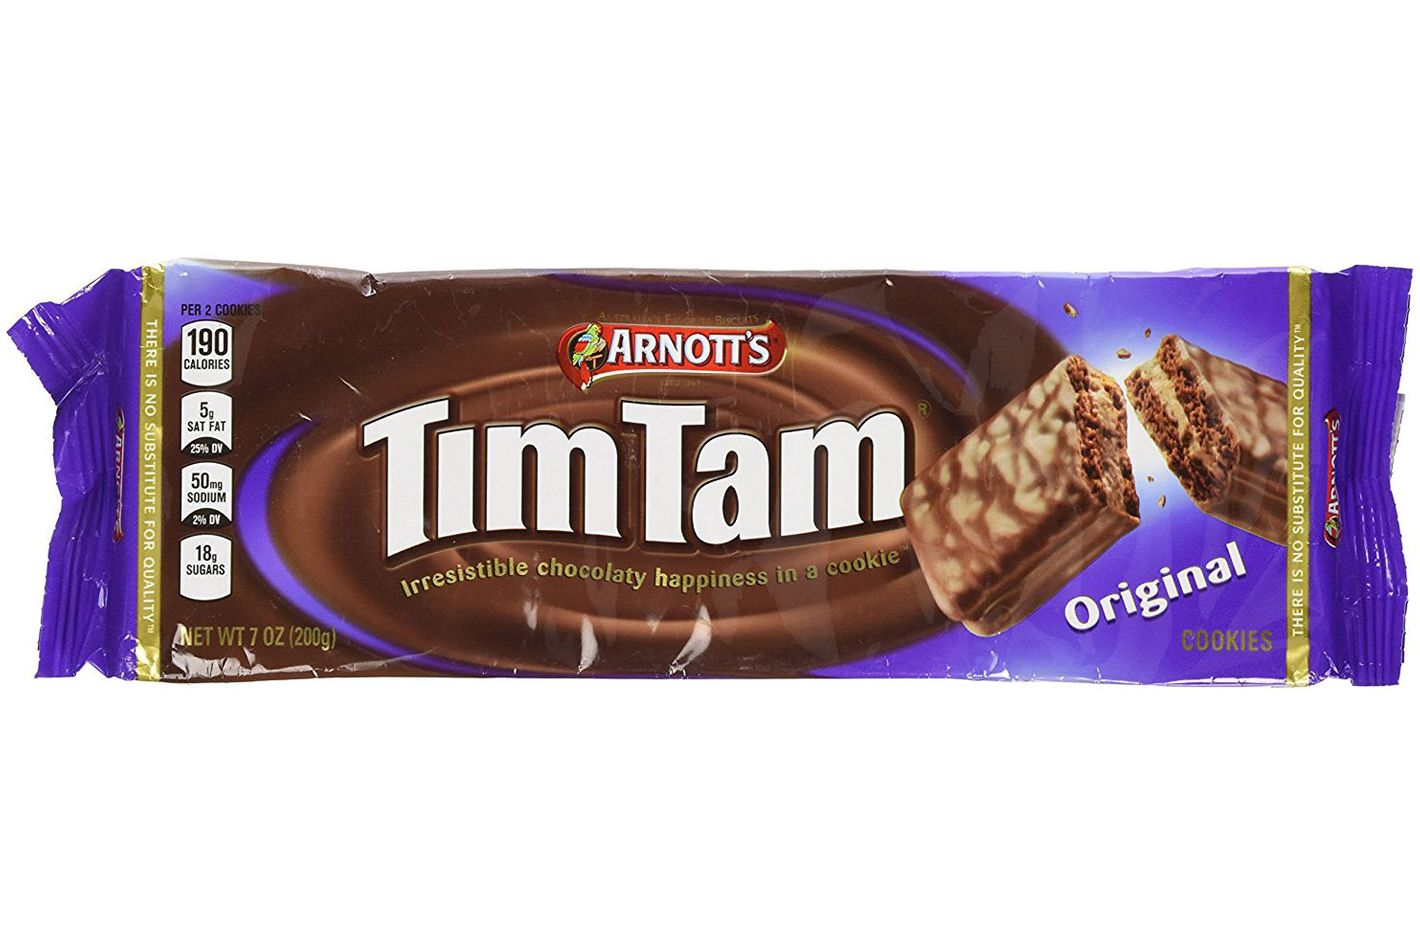 Arnott's Original Tim Tam, 7 oz.